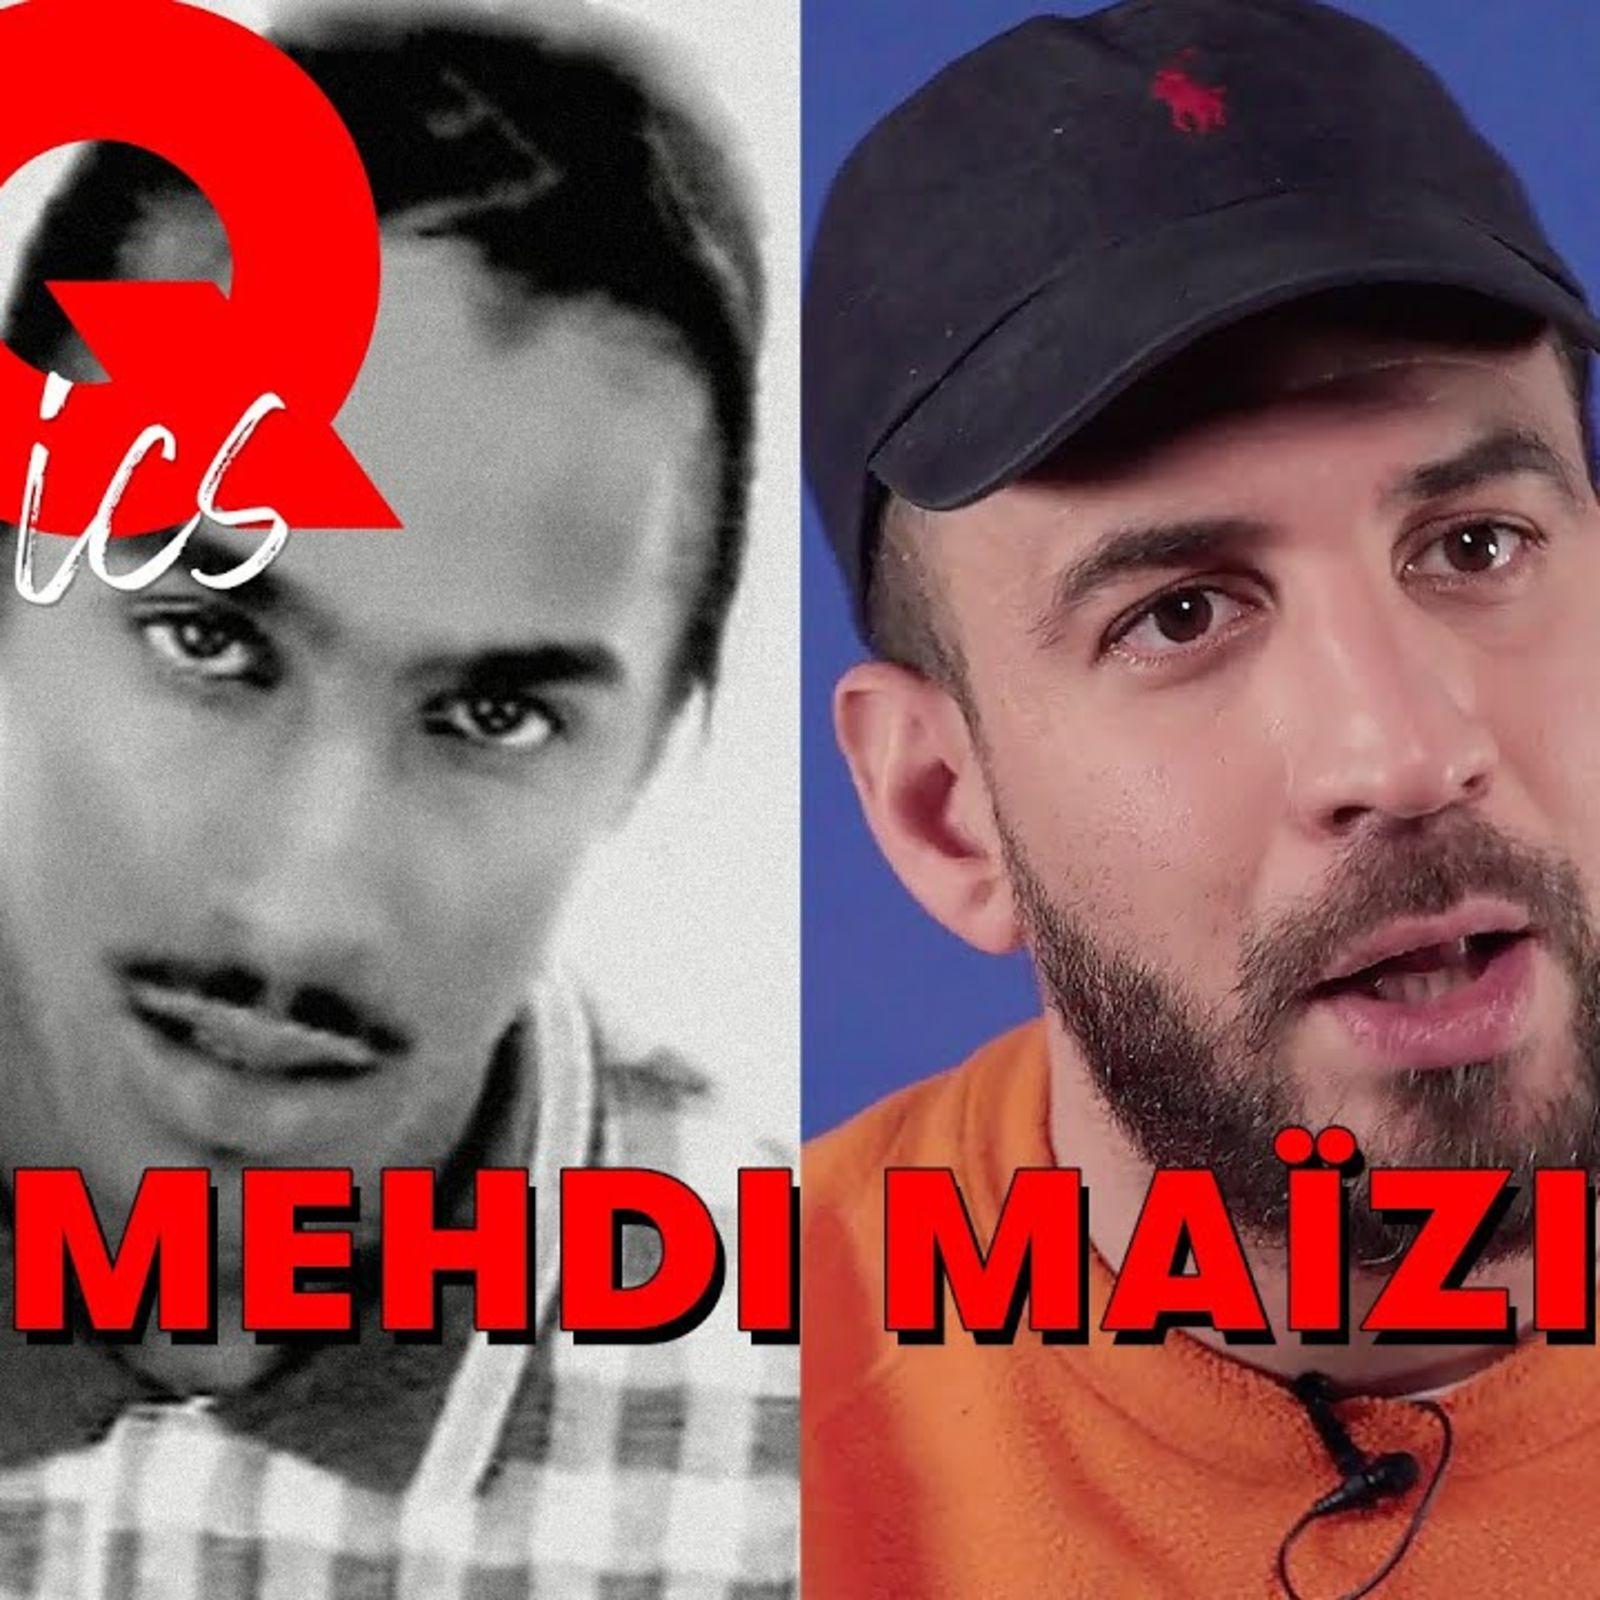 Mehdi Maïzi juge les classiques du rap français : Keny Arkana, Doc Gynéco, Stomy Bugsy…